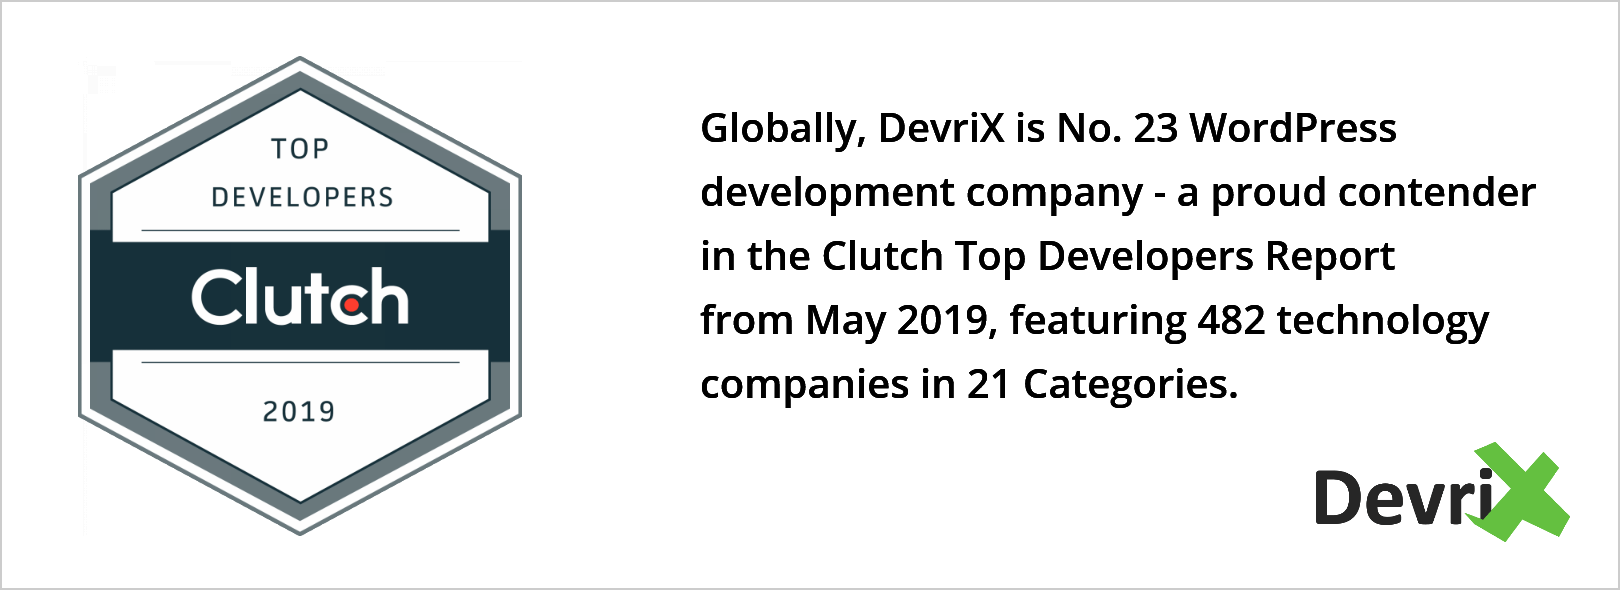 DevriX WordPress development company in Clutch 2019 Top Developers Report